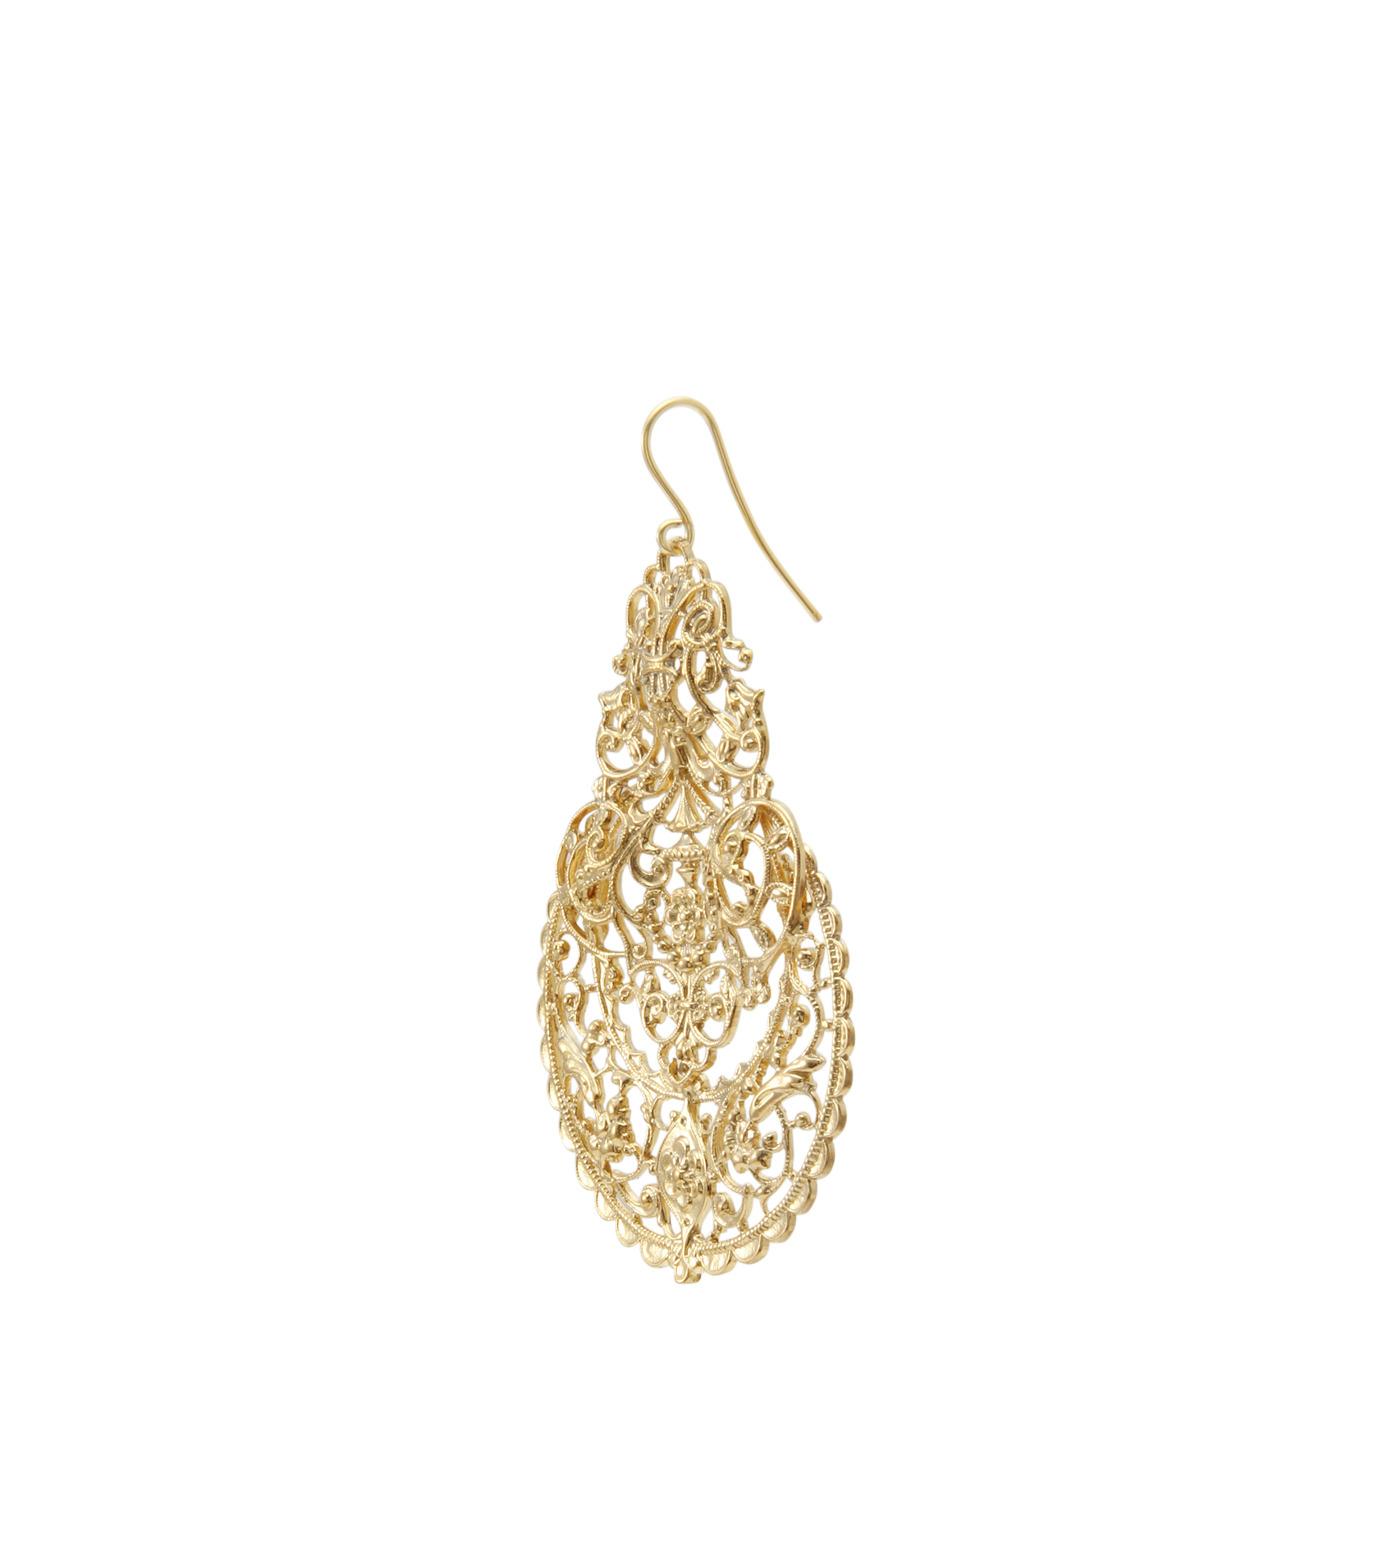 I AM by Ileana Makri(アイ アム バイ イリーナ マクリ)のAntoinette Earrings-GOLD-O489-42-099-2 拡大詳細画像2